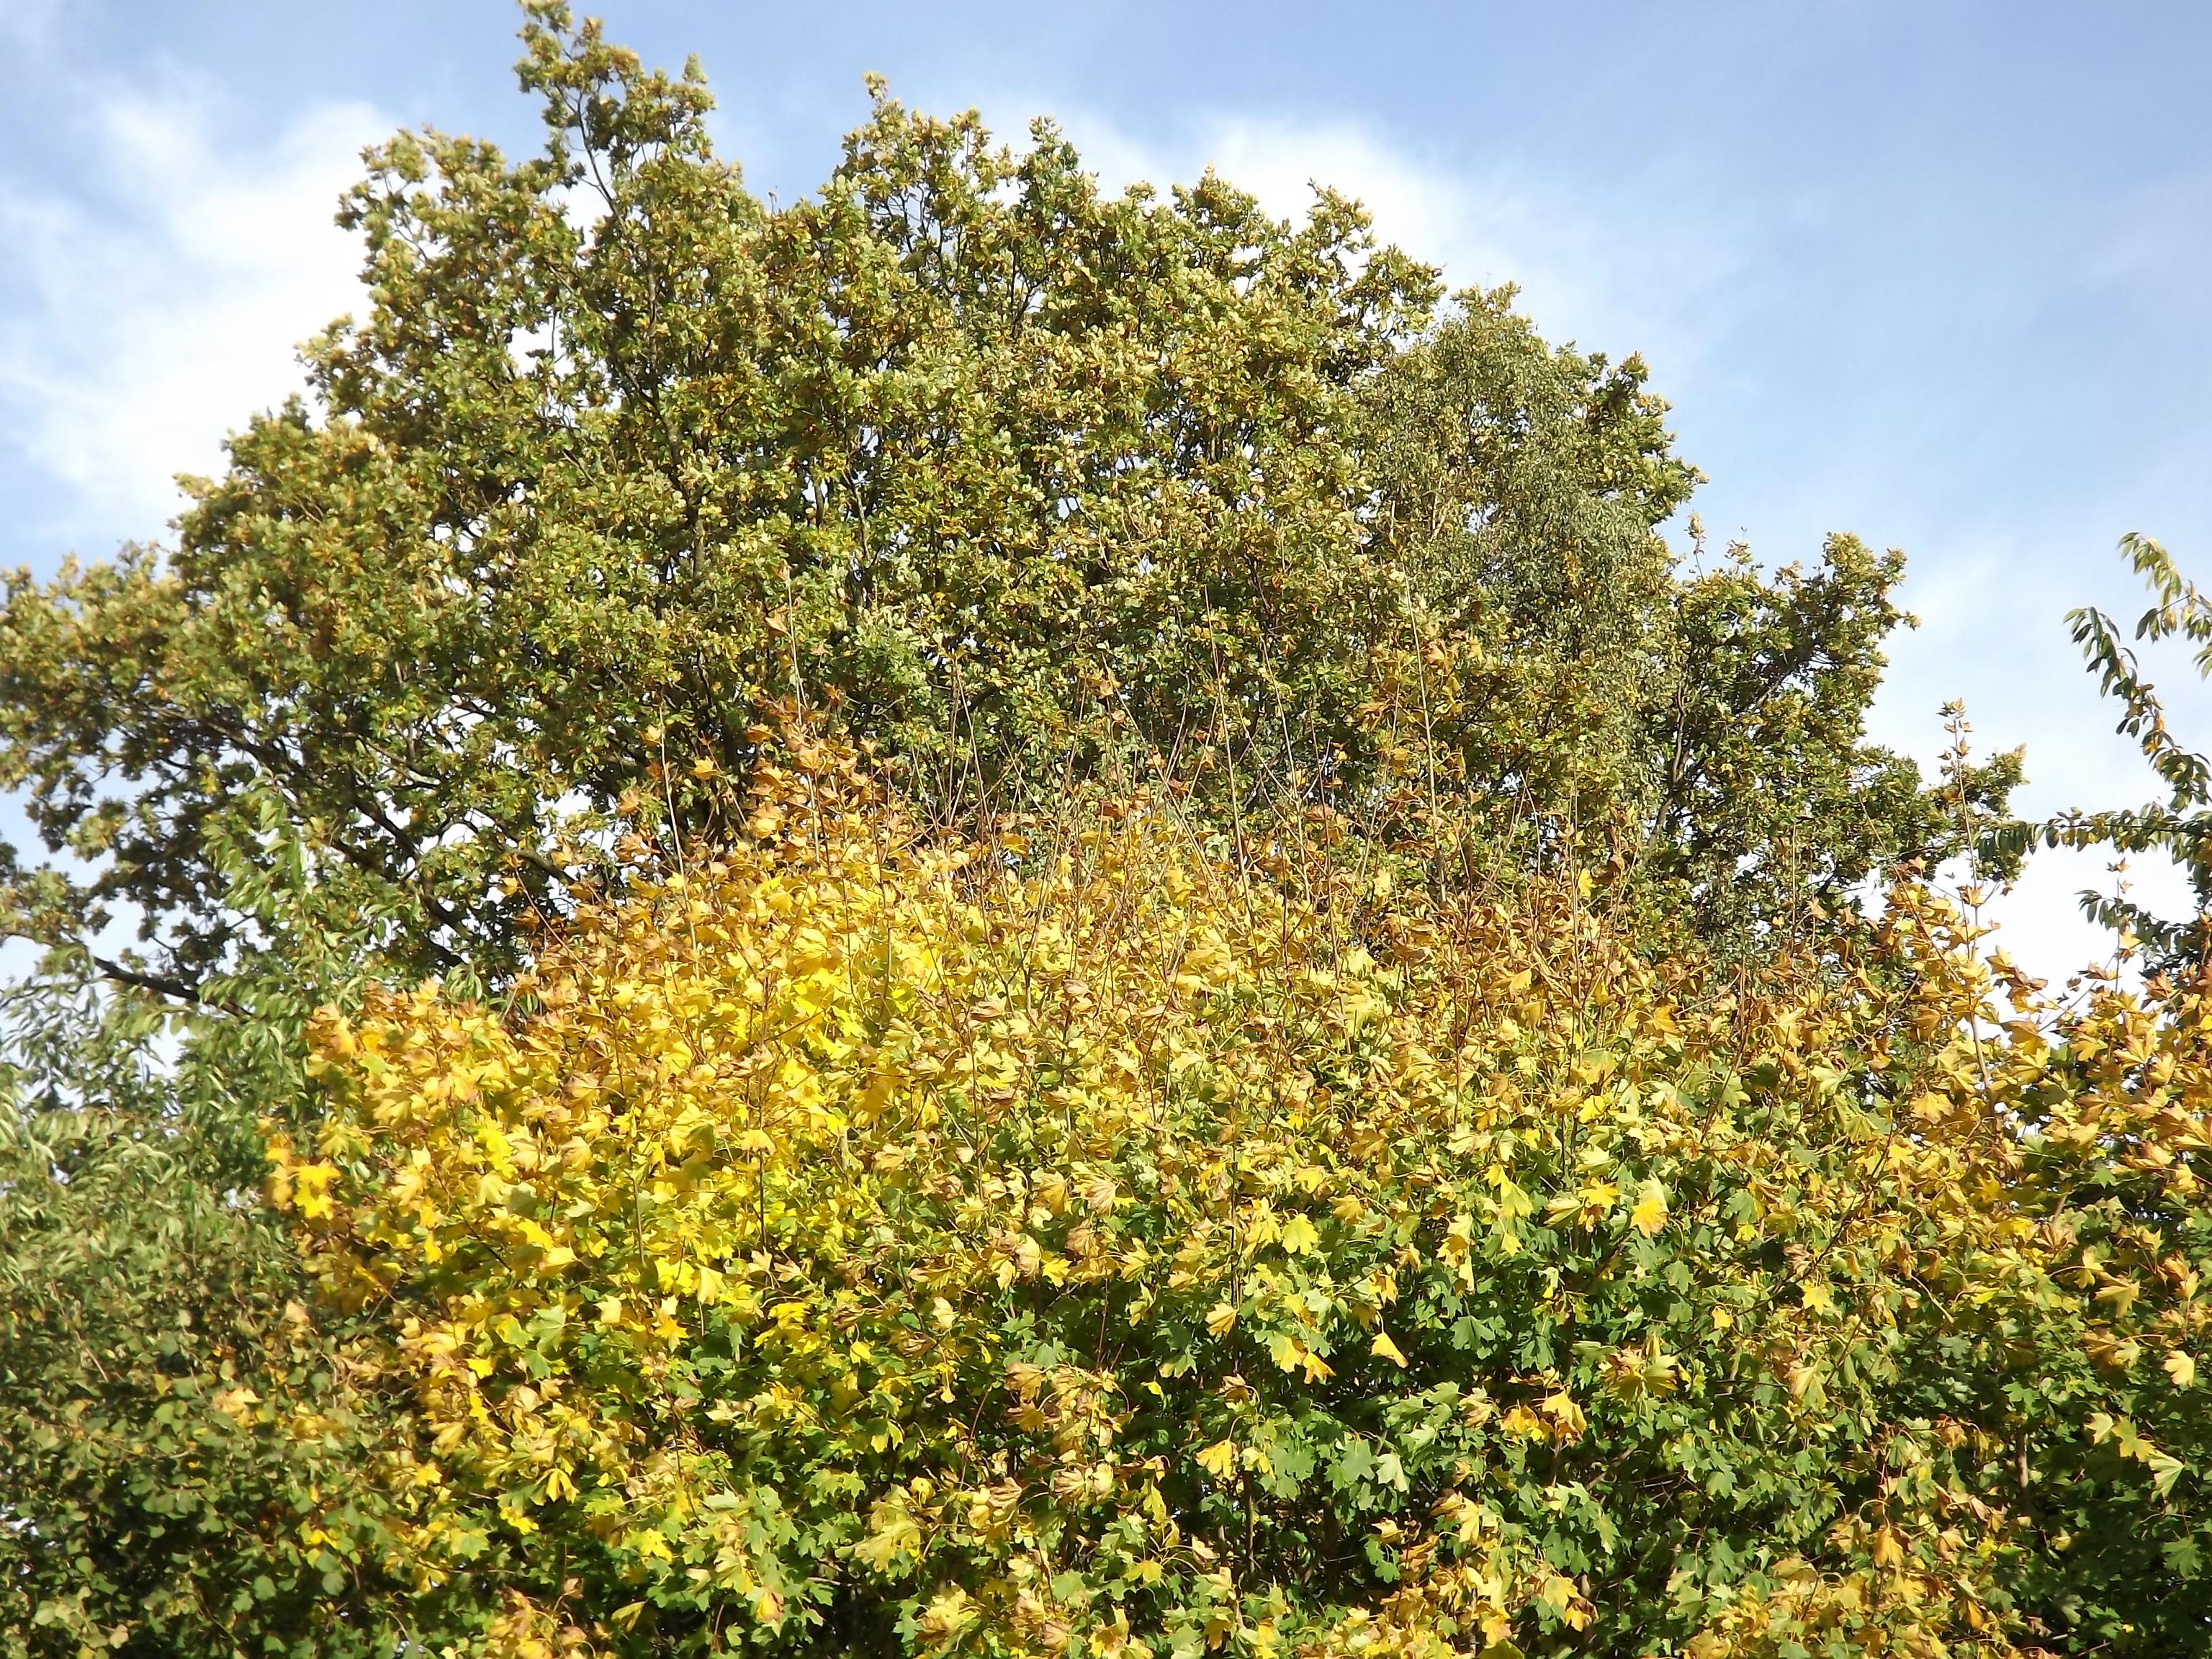 6541-gruen-gelb-rot-blaetter